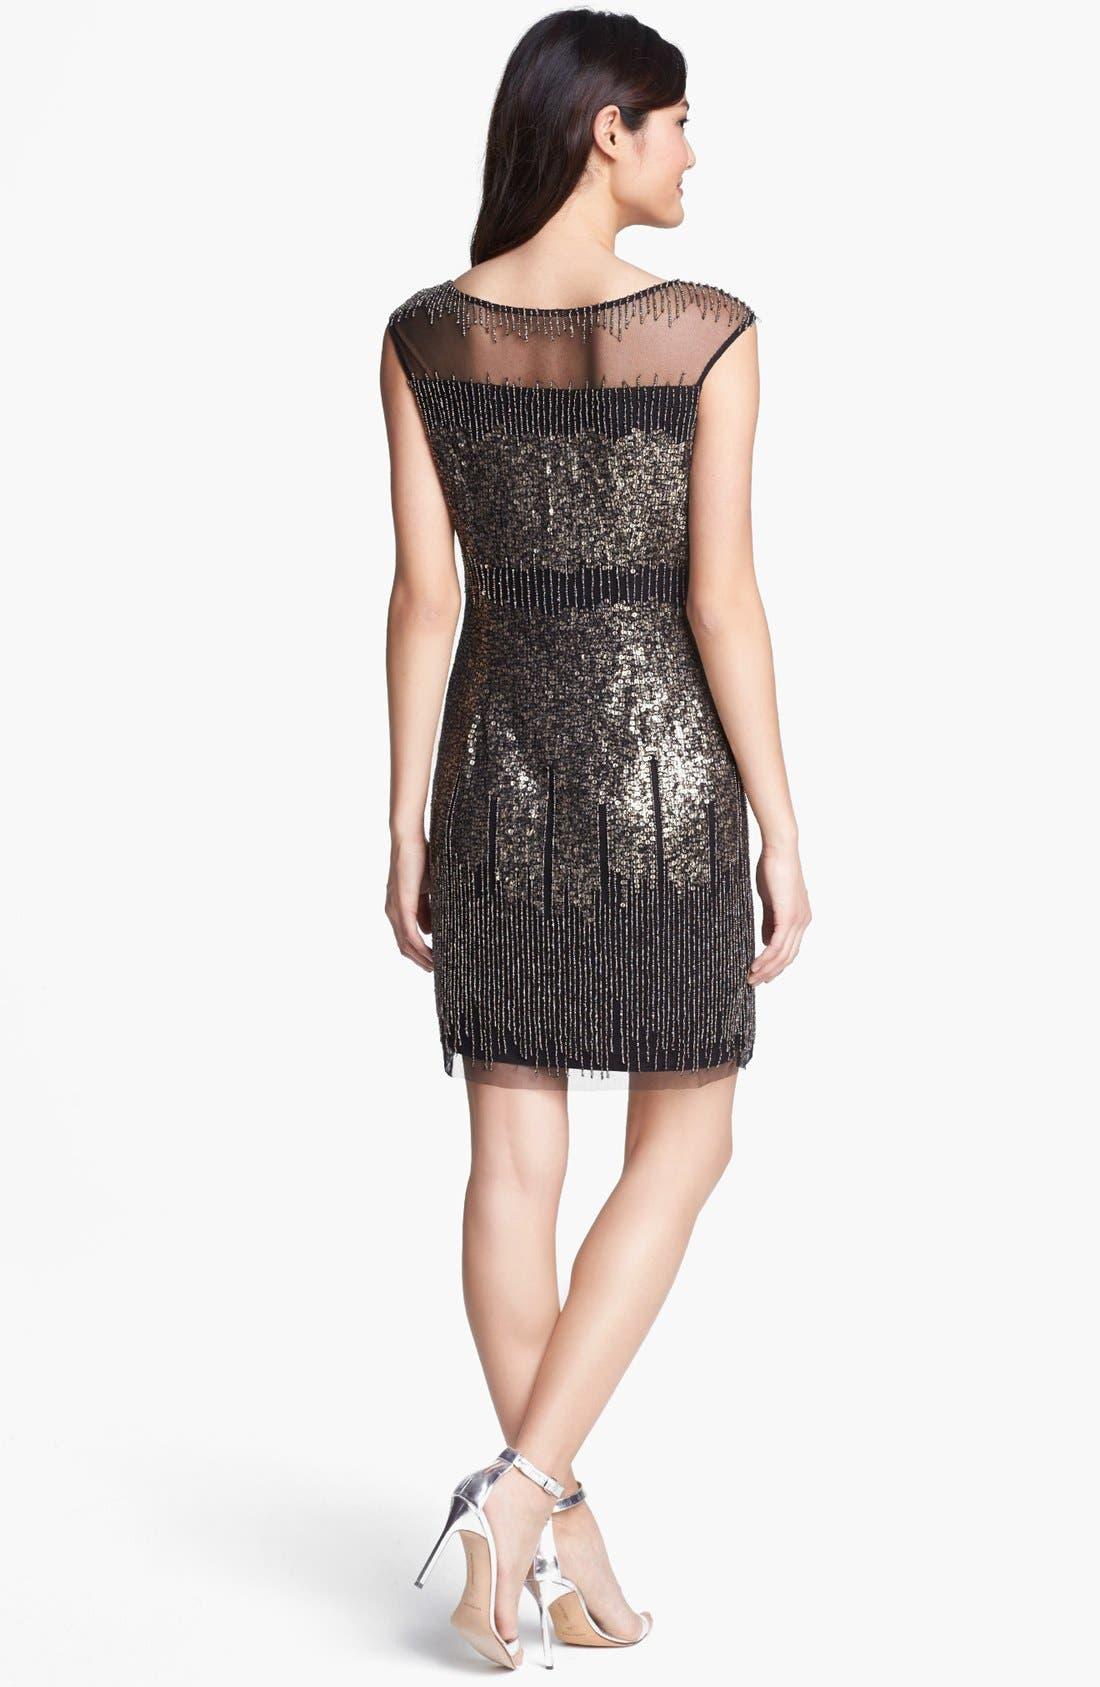 ADRIANNA PAPELL, Illusion Yoke Beaded Sheath Dress, Alternate thumbnail 3, color, 001